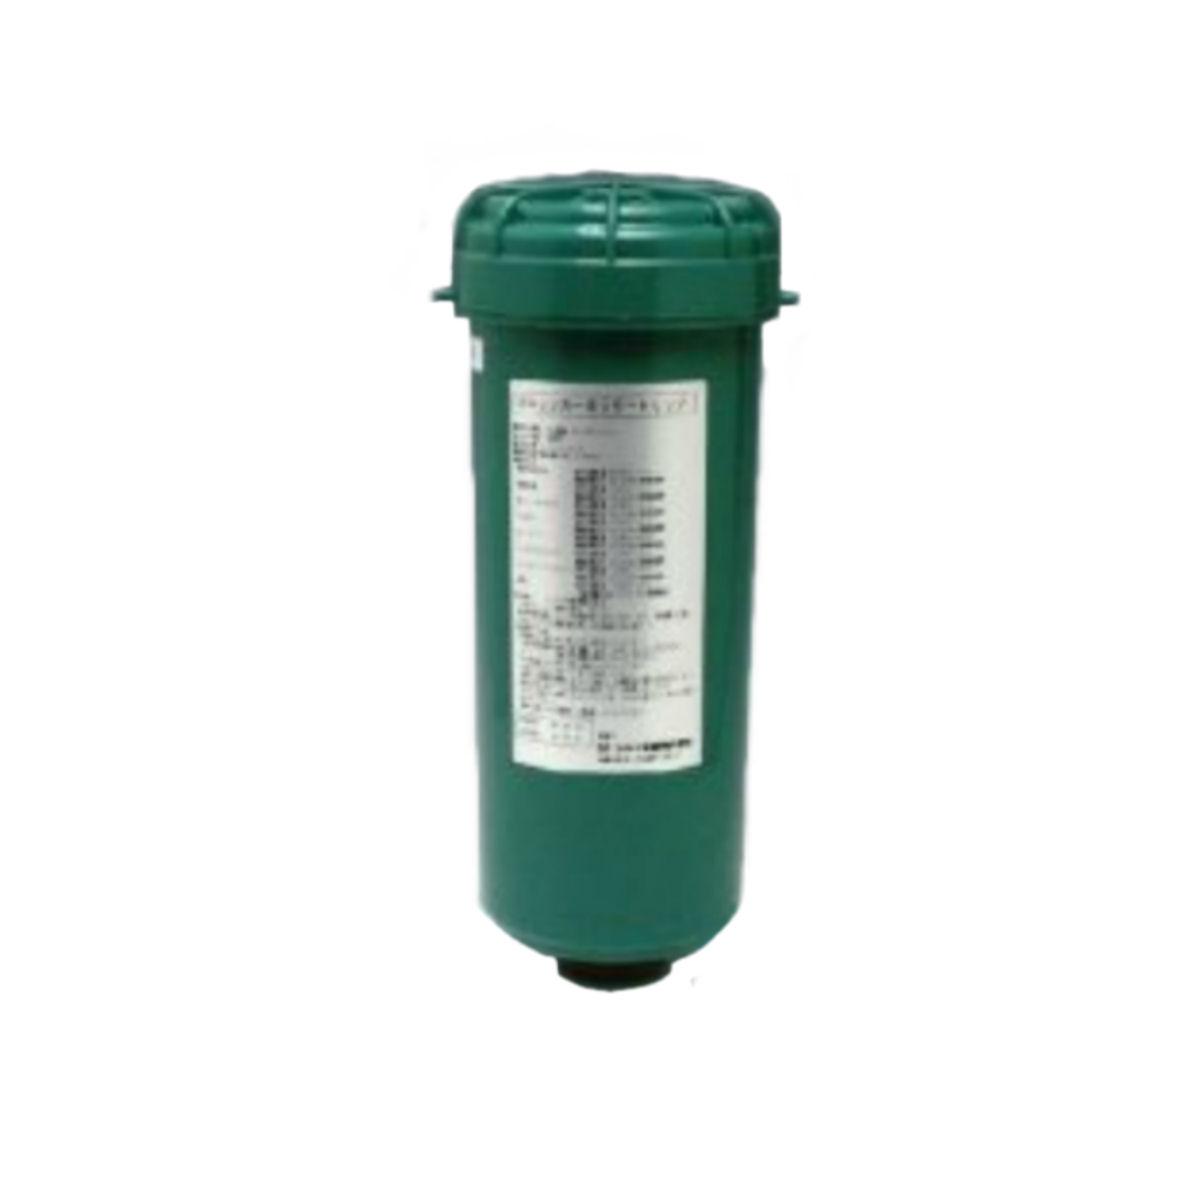 CJ-3000BK 浄活水器ピュアリズム2 用交換カードリッジ